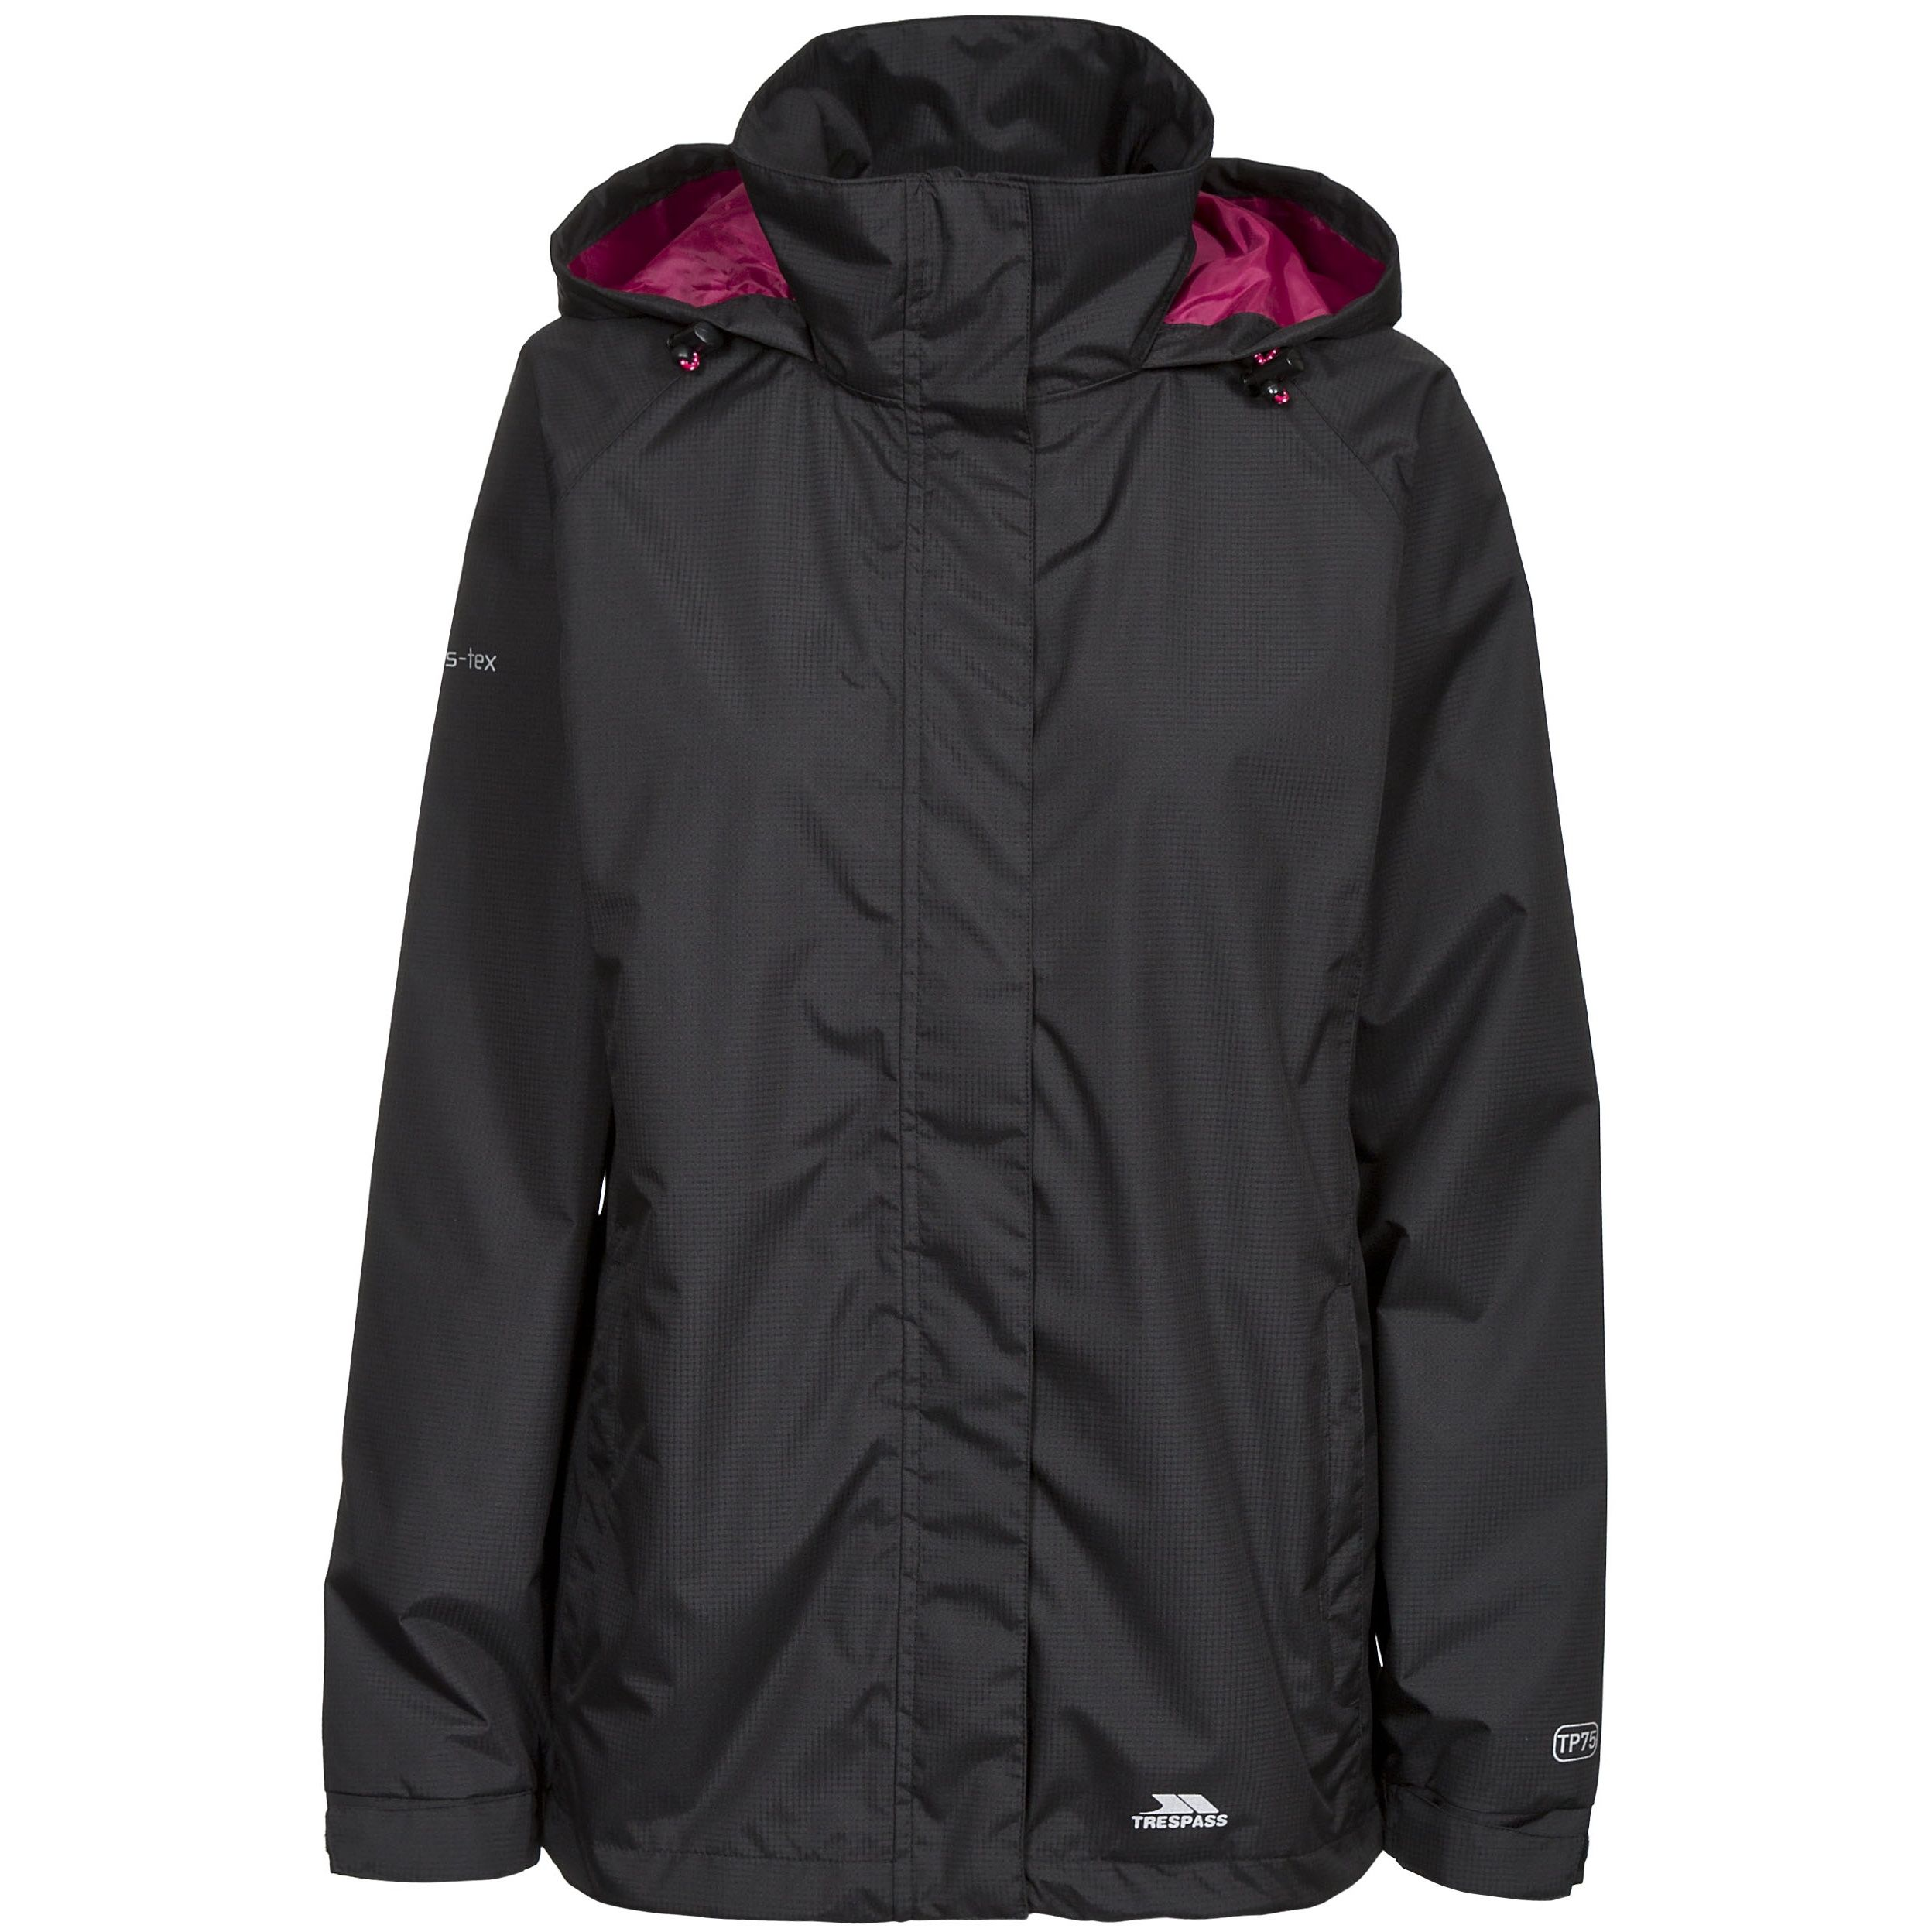 Trespass Womens/Ladies Lanna II Waterproof Jacket